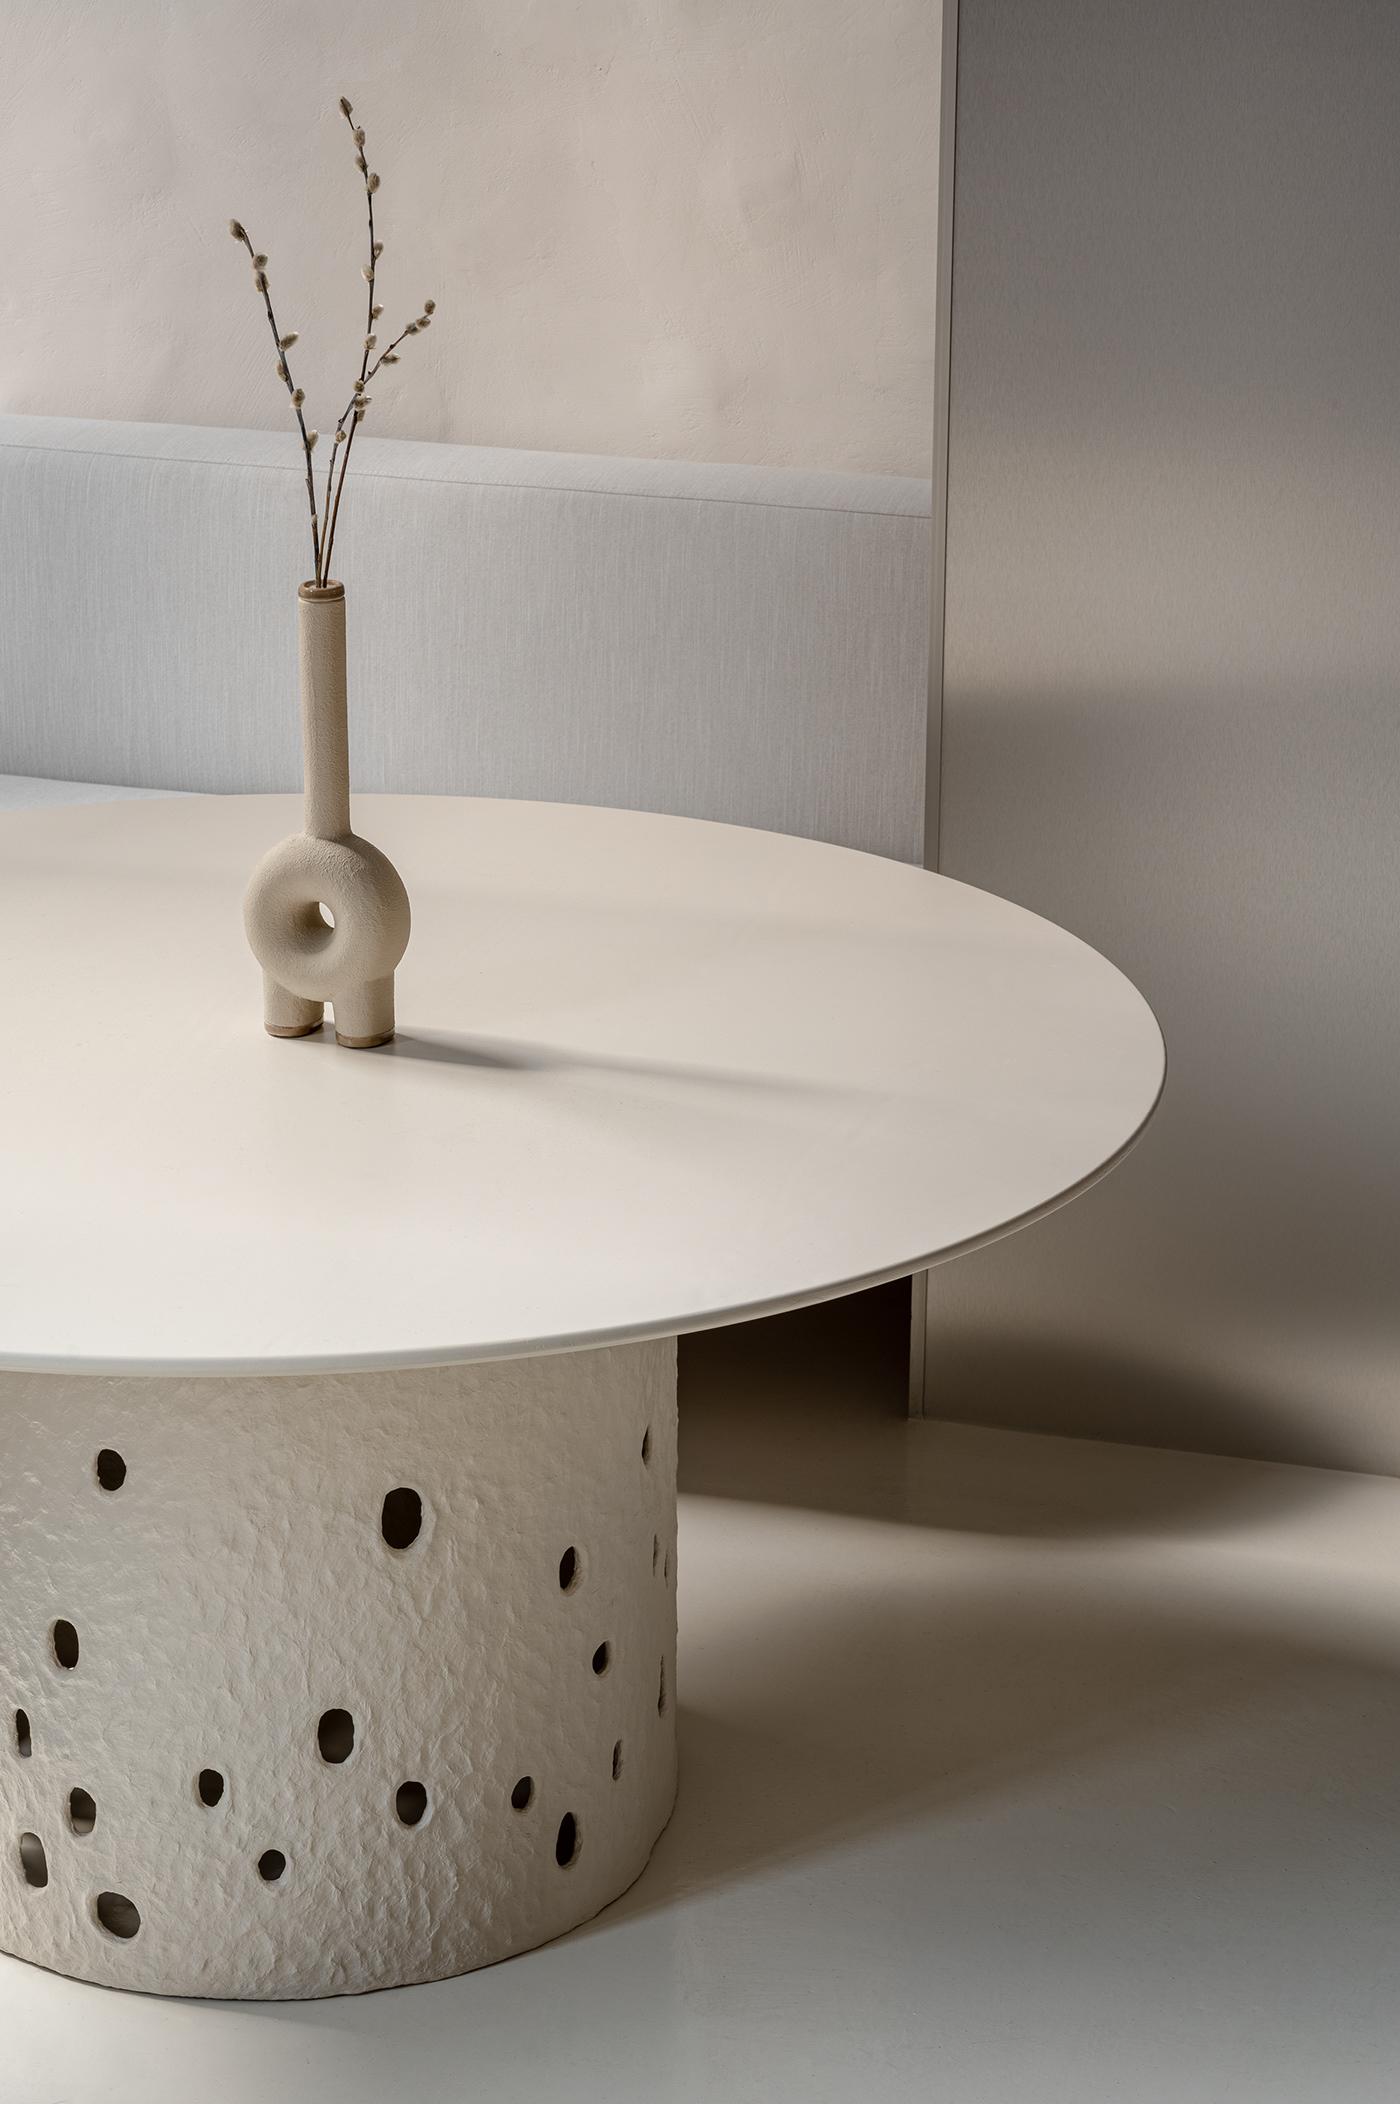 clay design Ethno Faina   Interior light minimal rough soft stone